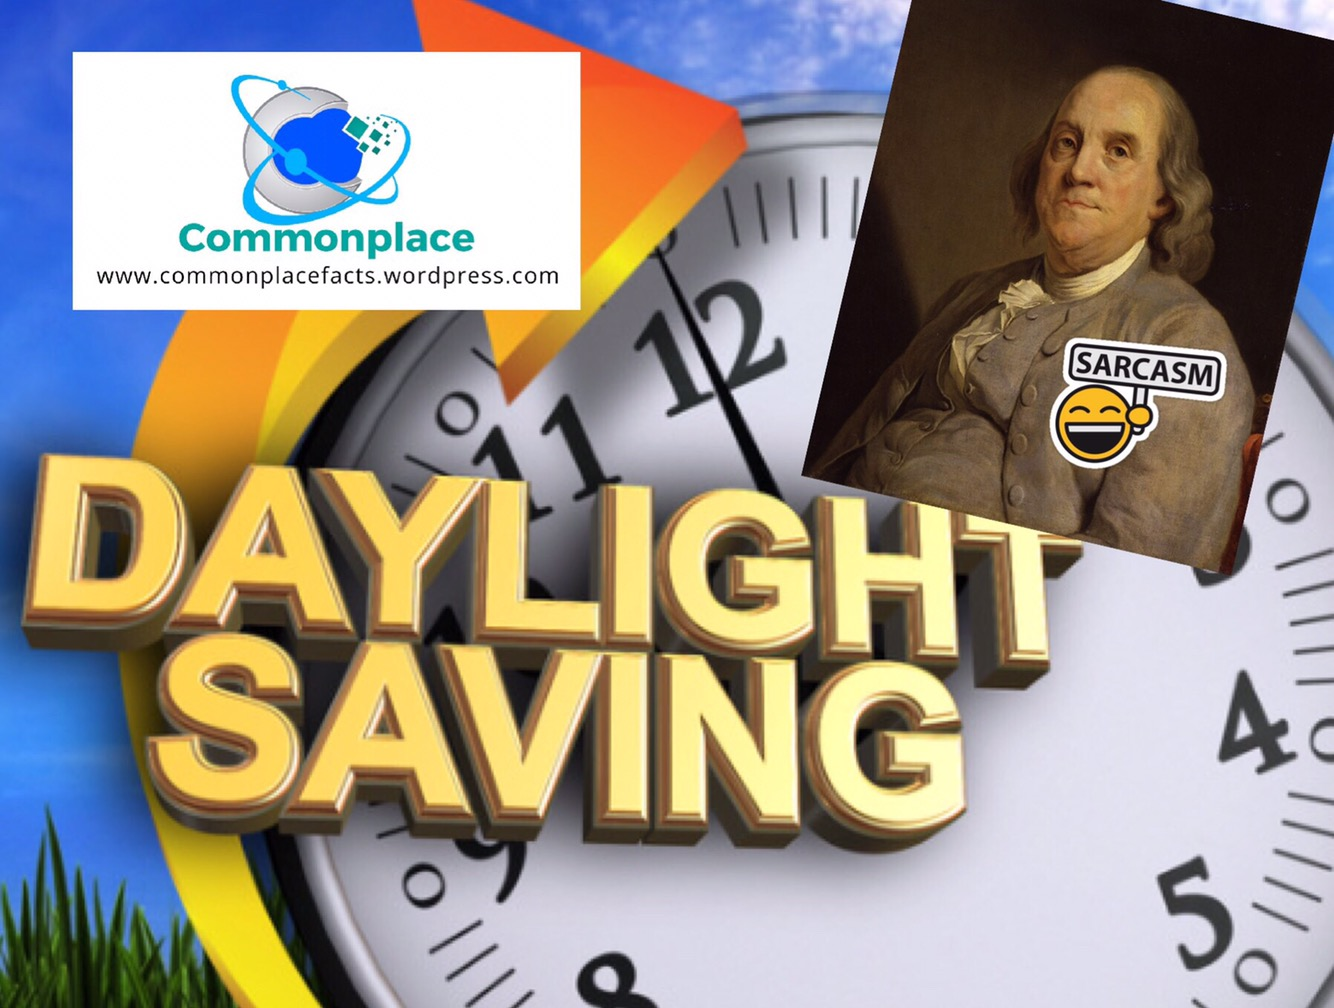 Benjamin Franklin proposed Daylight Savings Time as a joke